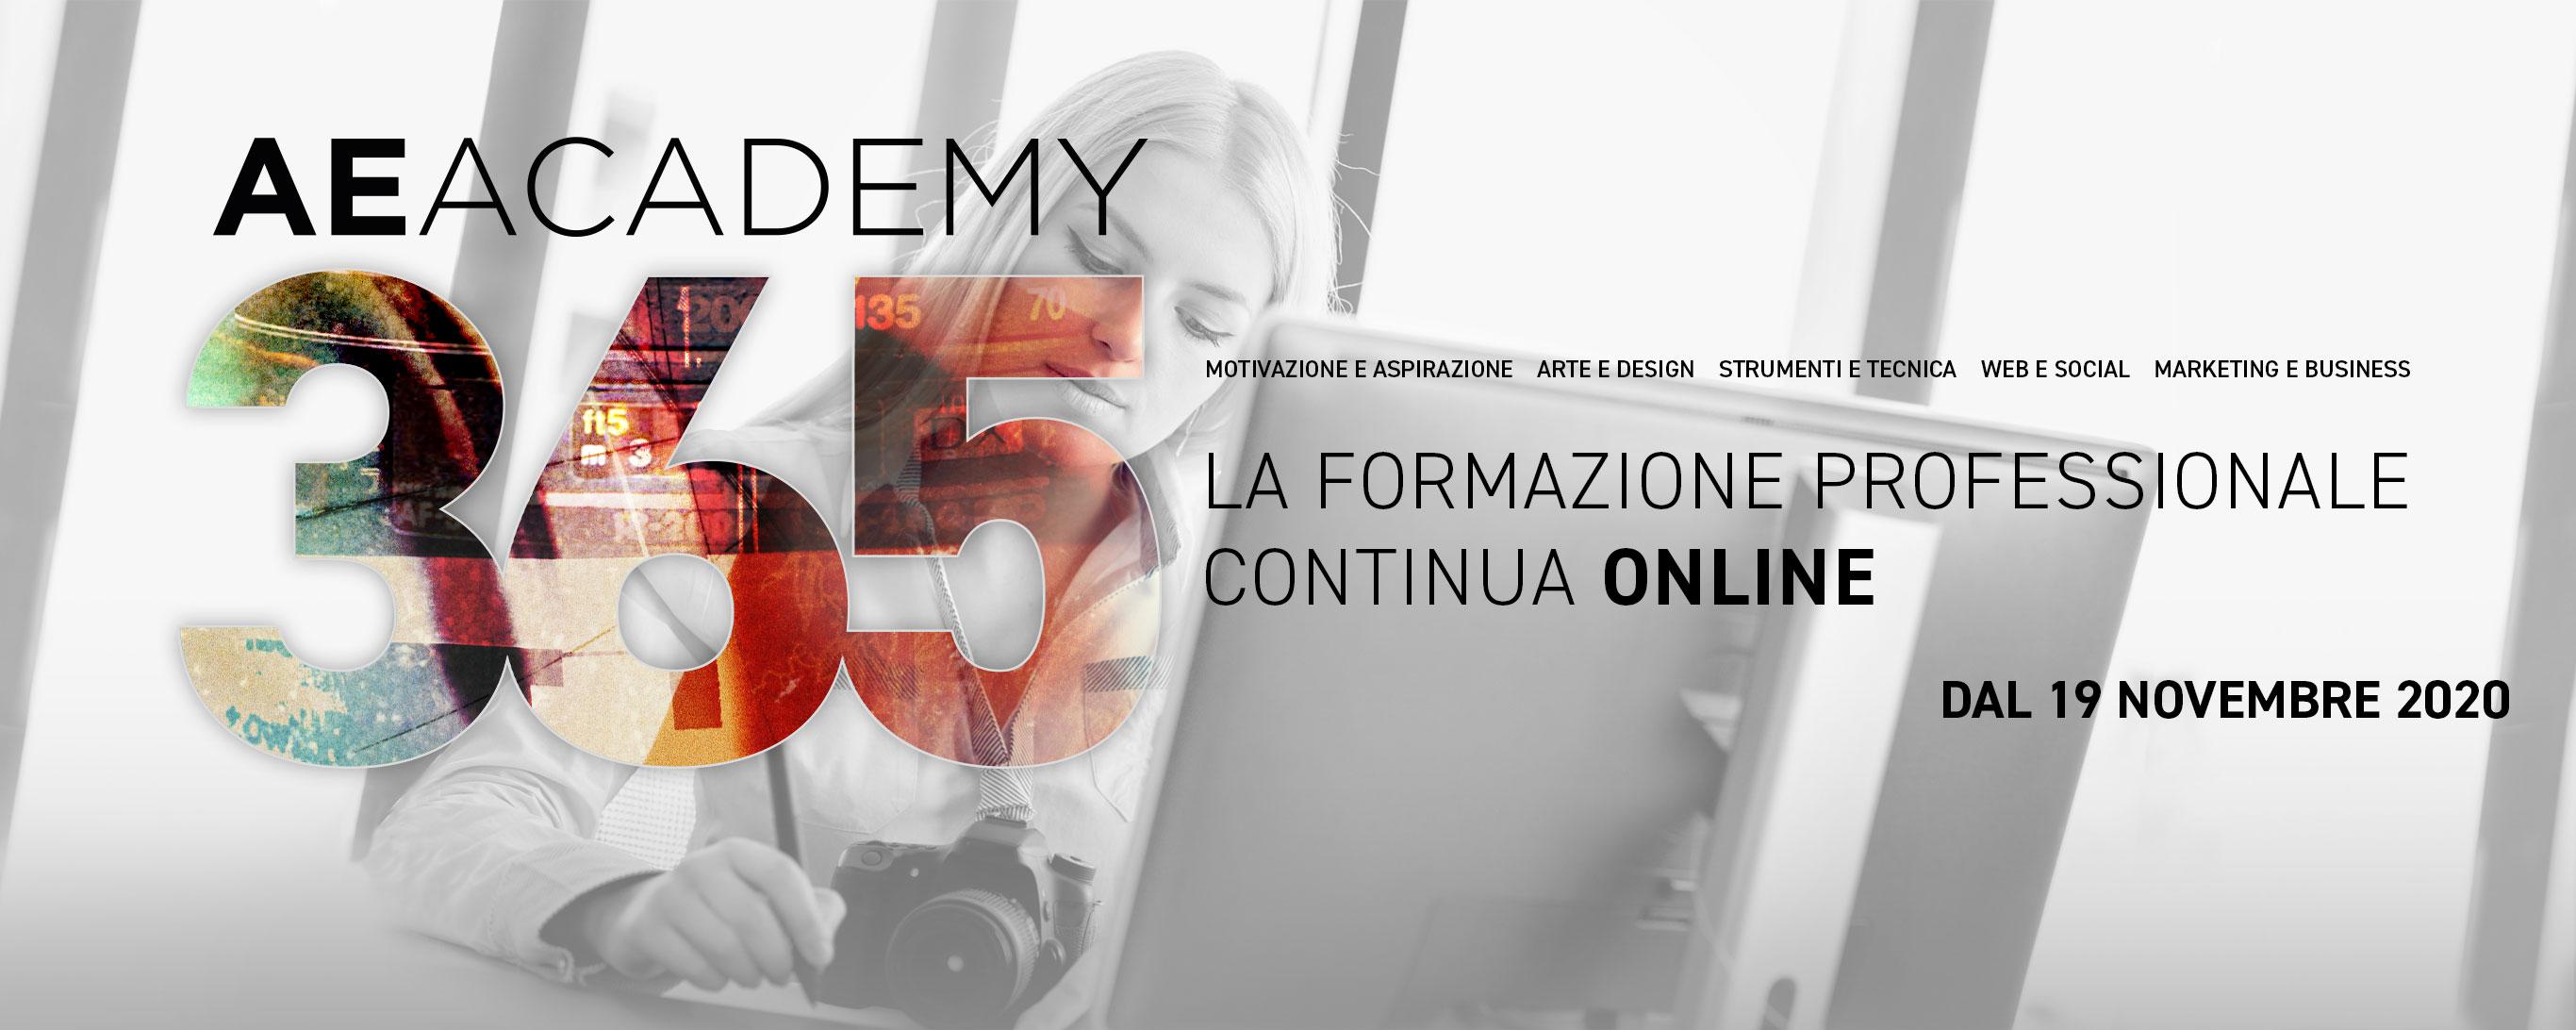 Bn-sito_Academy-2020_DEFINITIVO_donna